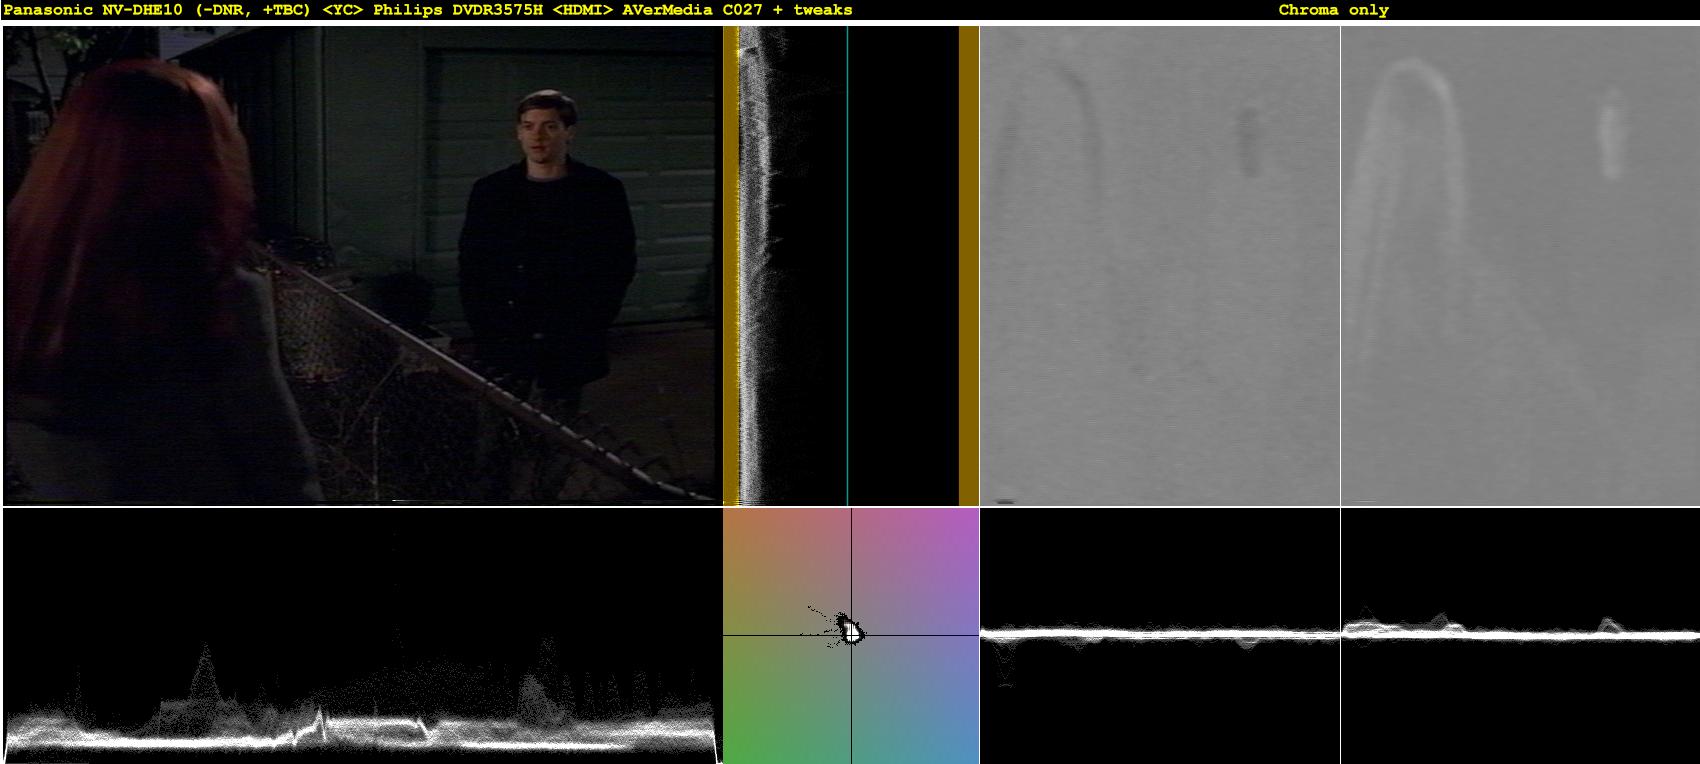 Click image for larger version  Name:0-37-50 - Panasonic NV-DHE10 (-DNR, +TBC).png Views:783 Size:852.2 KB ID:37993